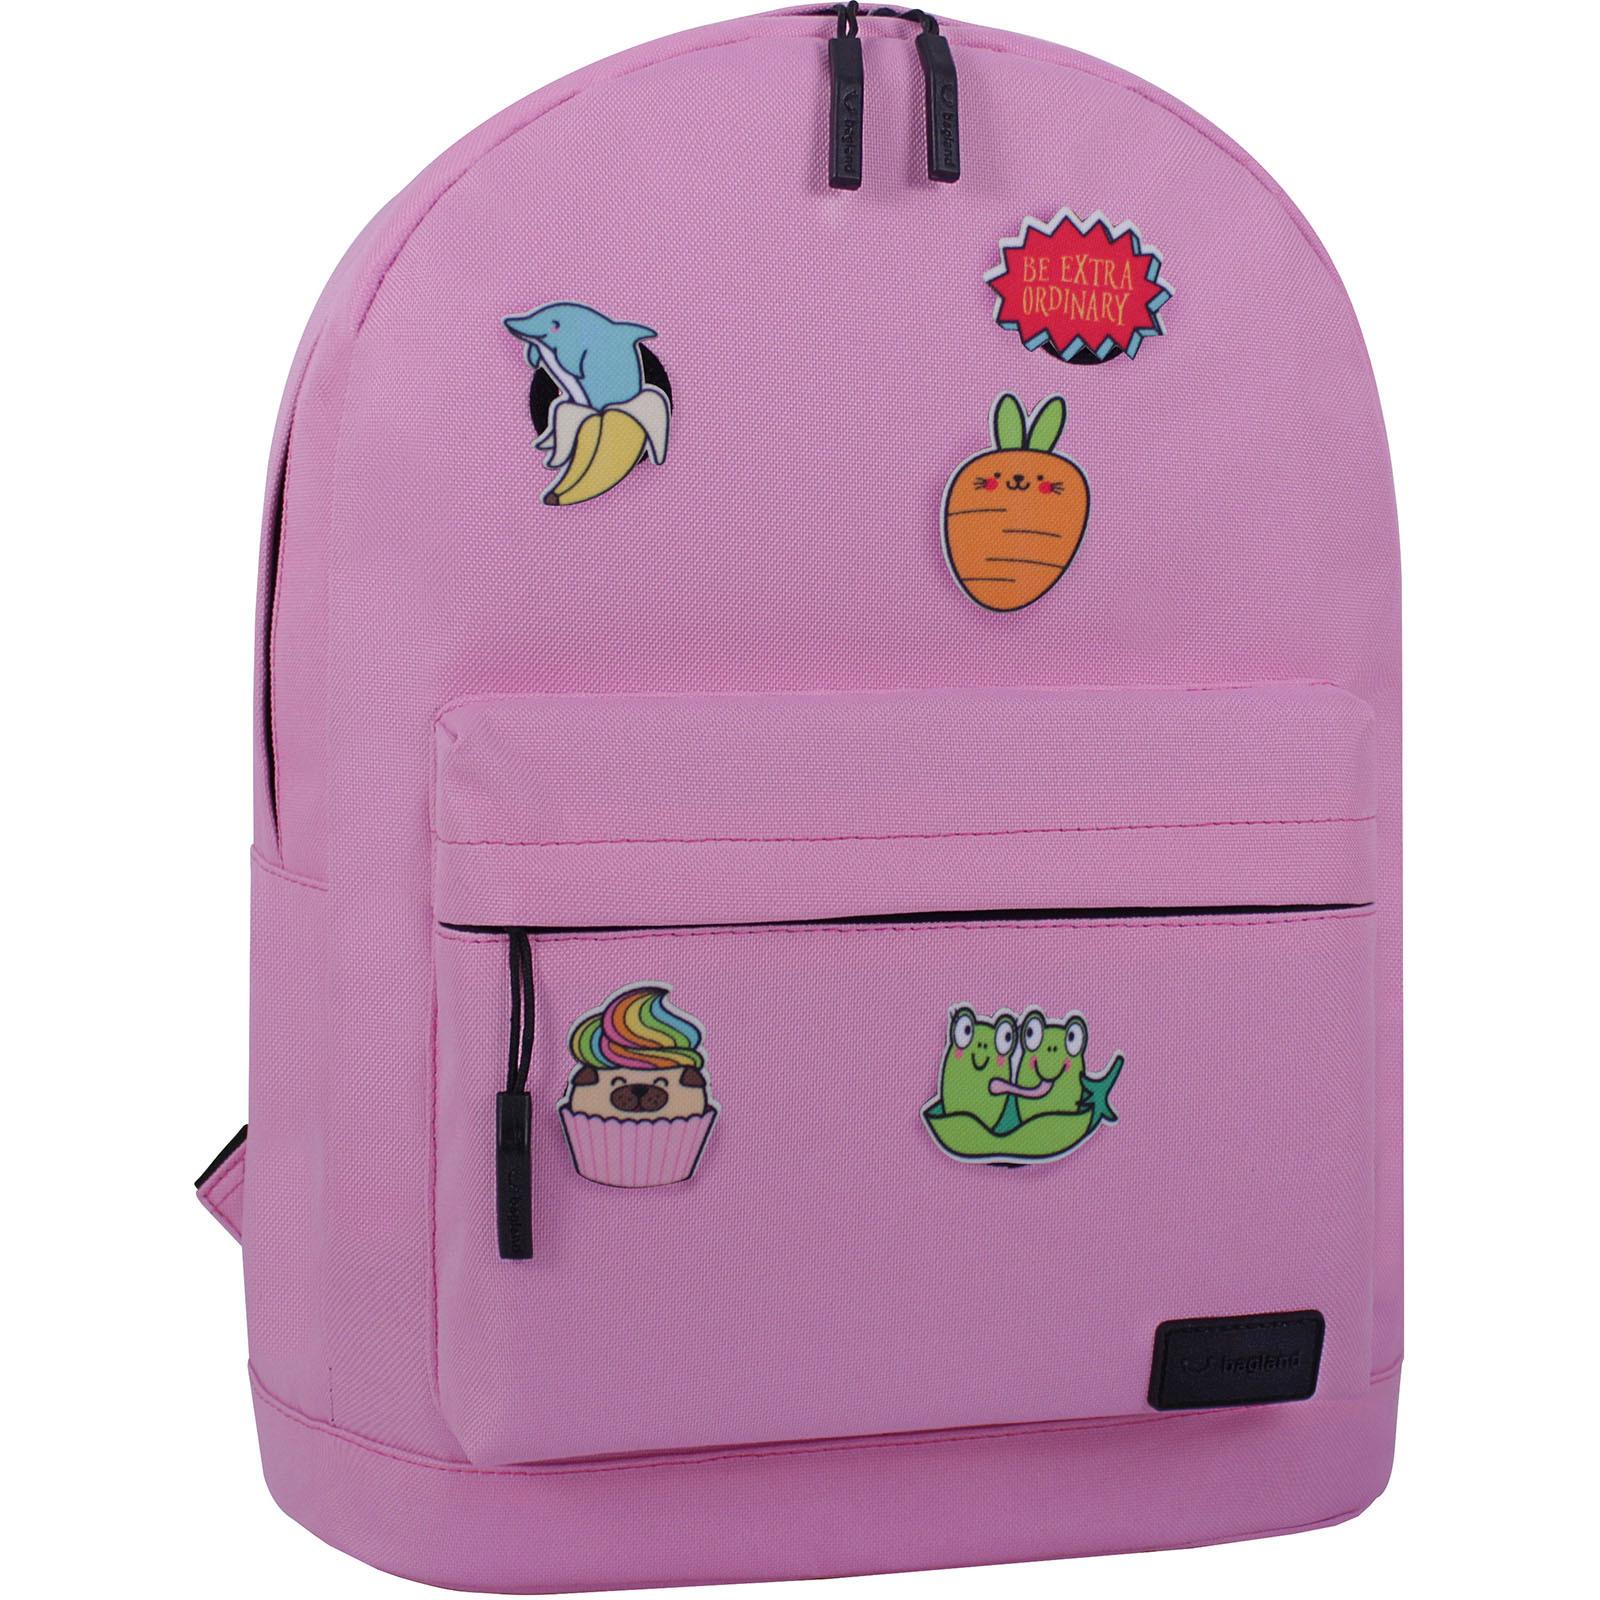 Молодежные рюкзаки Рюкзак Bagland Молодежный W/R 17 л. 140 розовый (00533662 Ш) IMG_3138.JPG